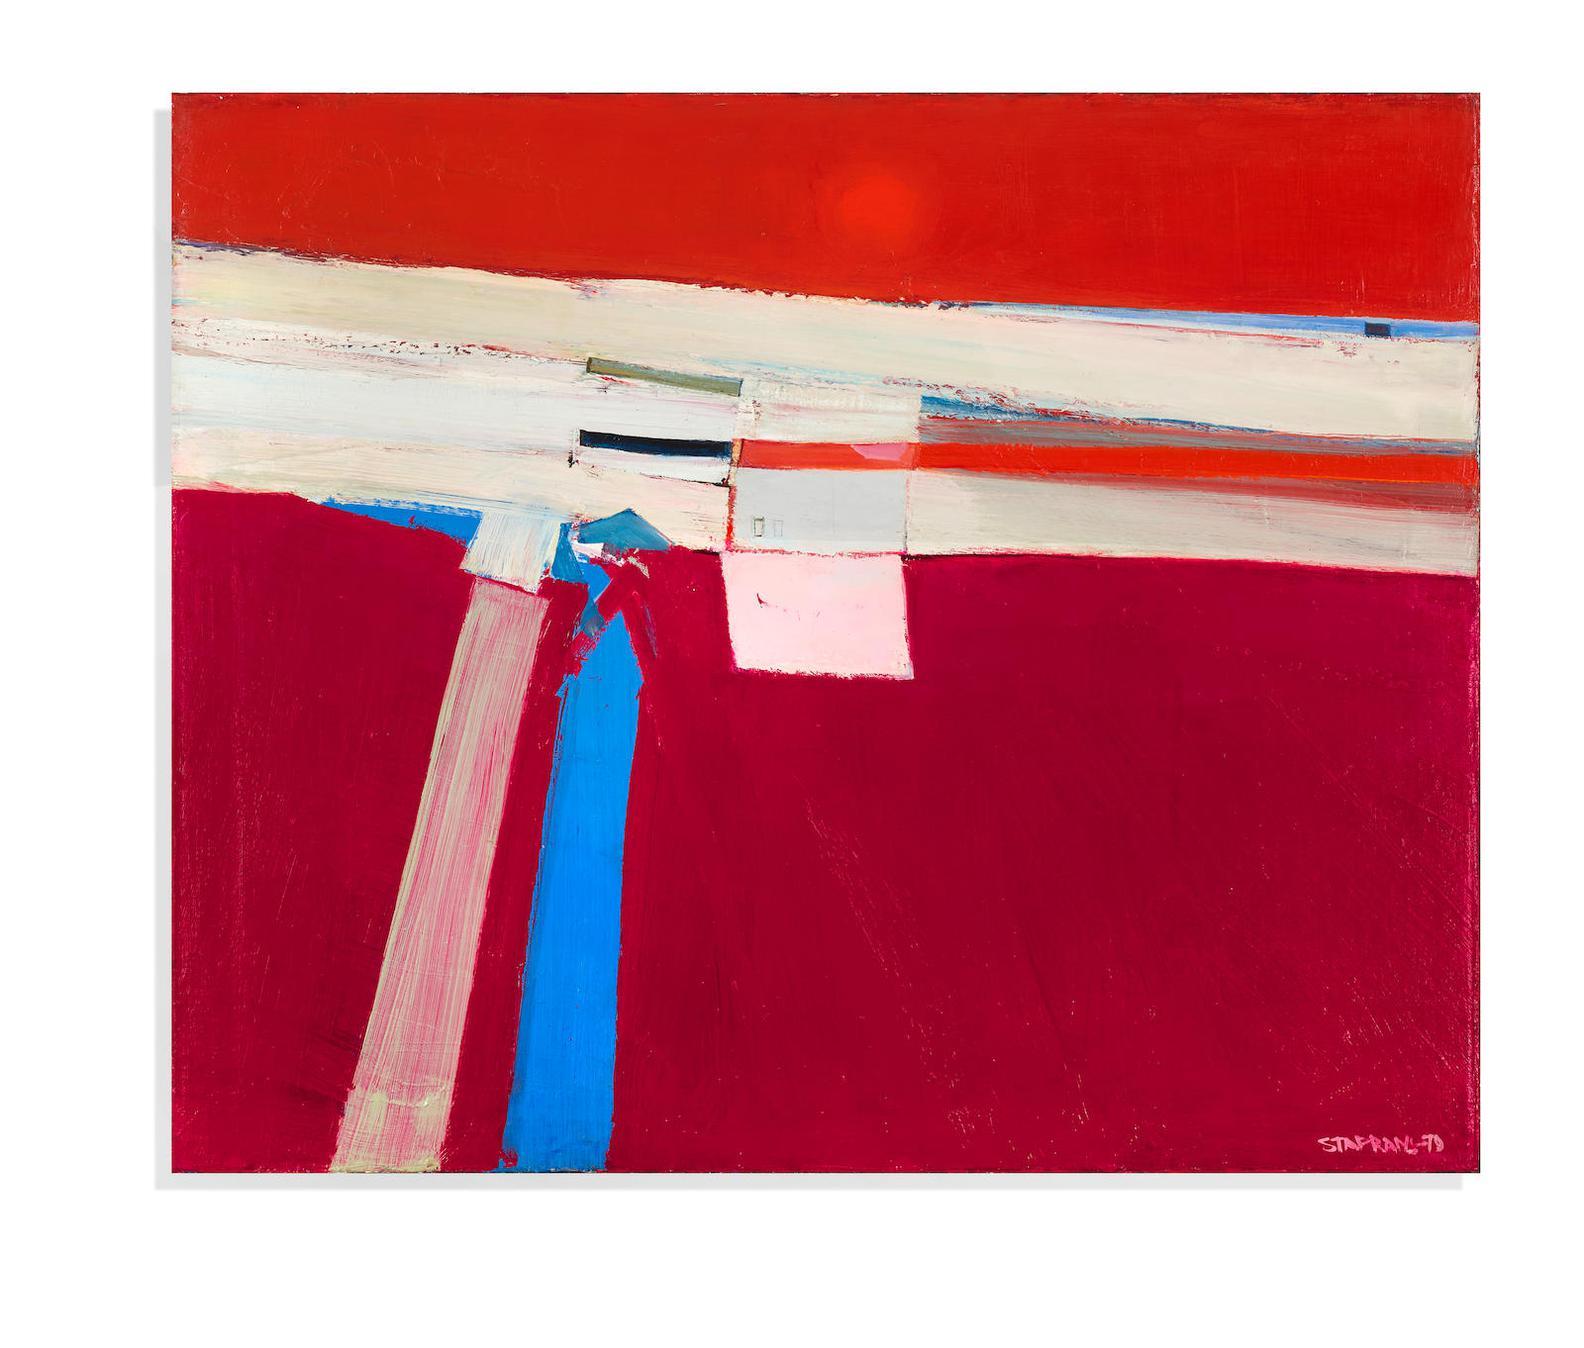 Raimonds Staprans-Untitled-1979